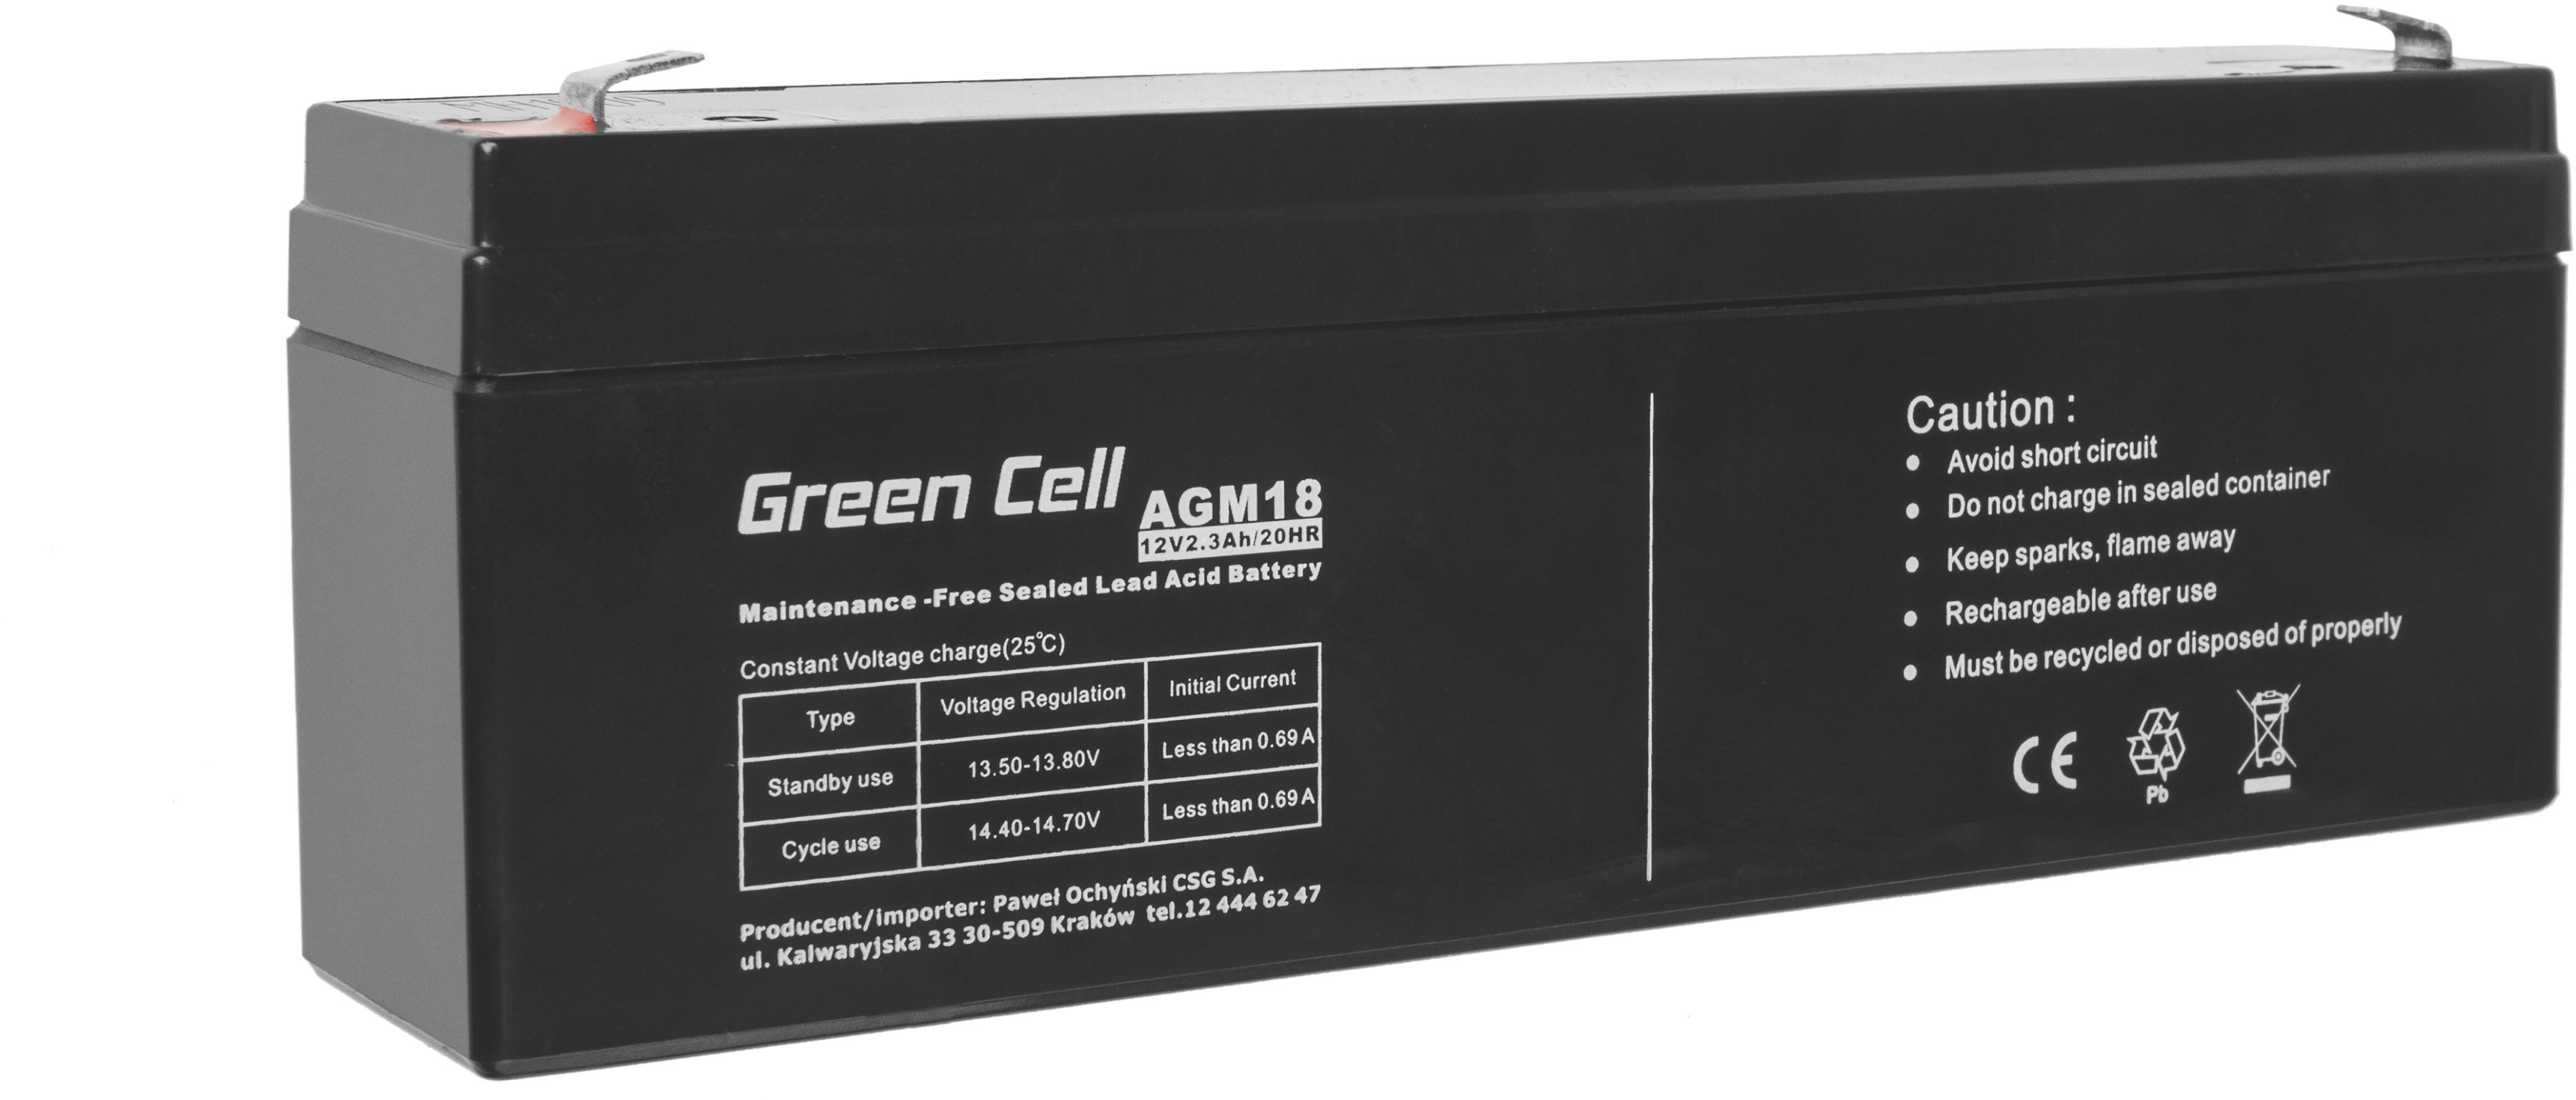 Green Cell AGM VRLA 12V 2.3Ah bezobsługowy akumulator do systemu alarmowego kasy fiskalnej zabawki